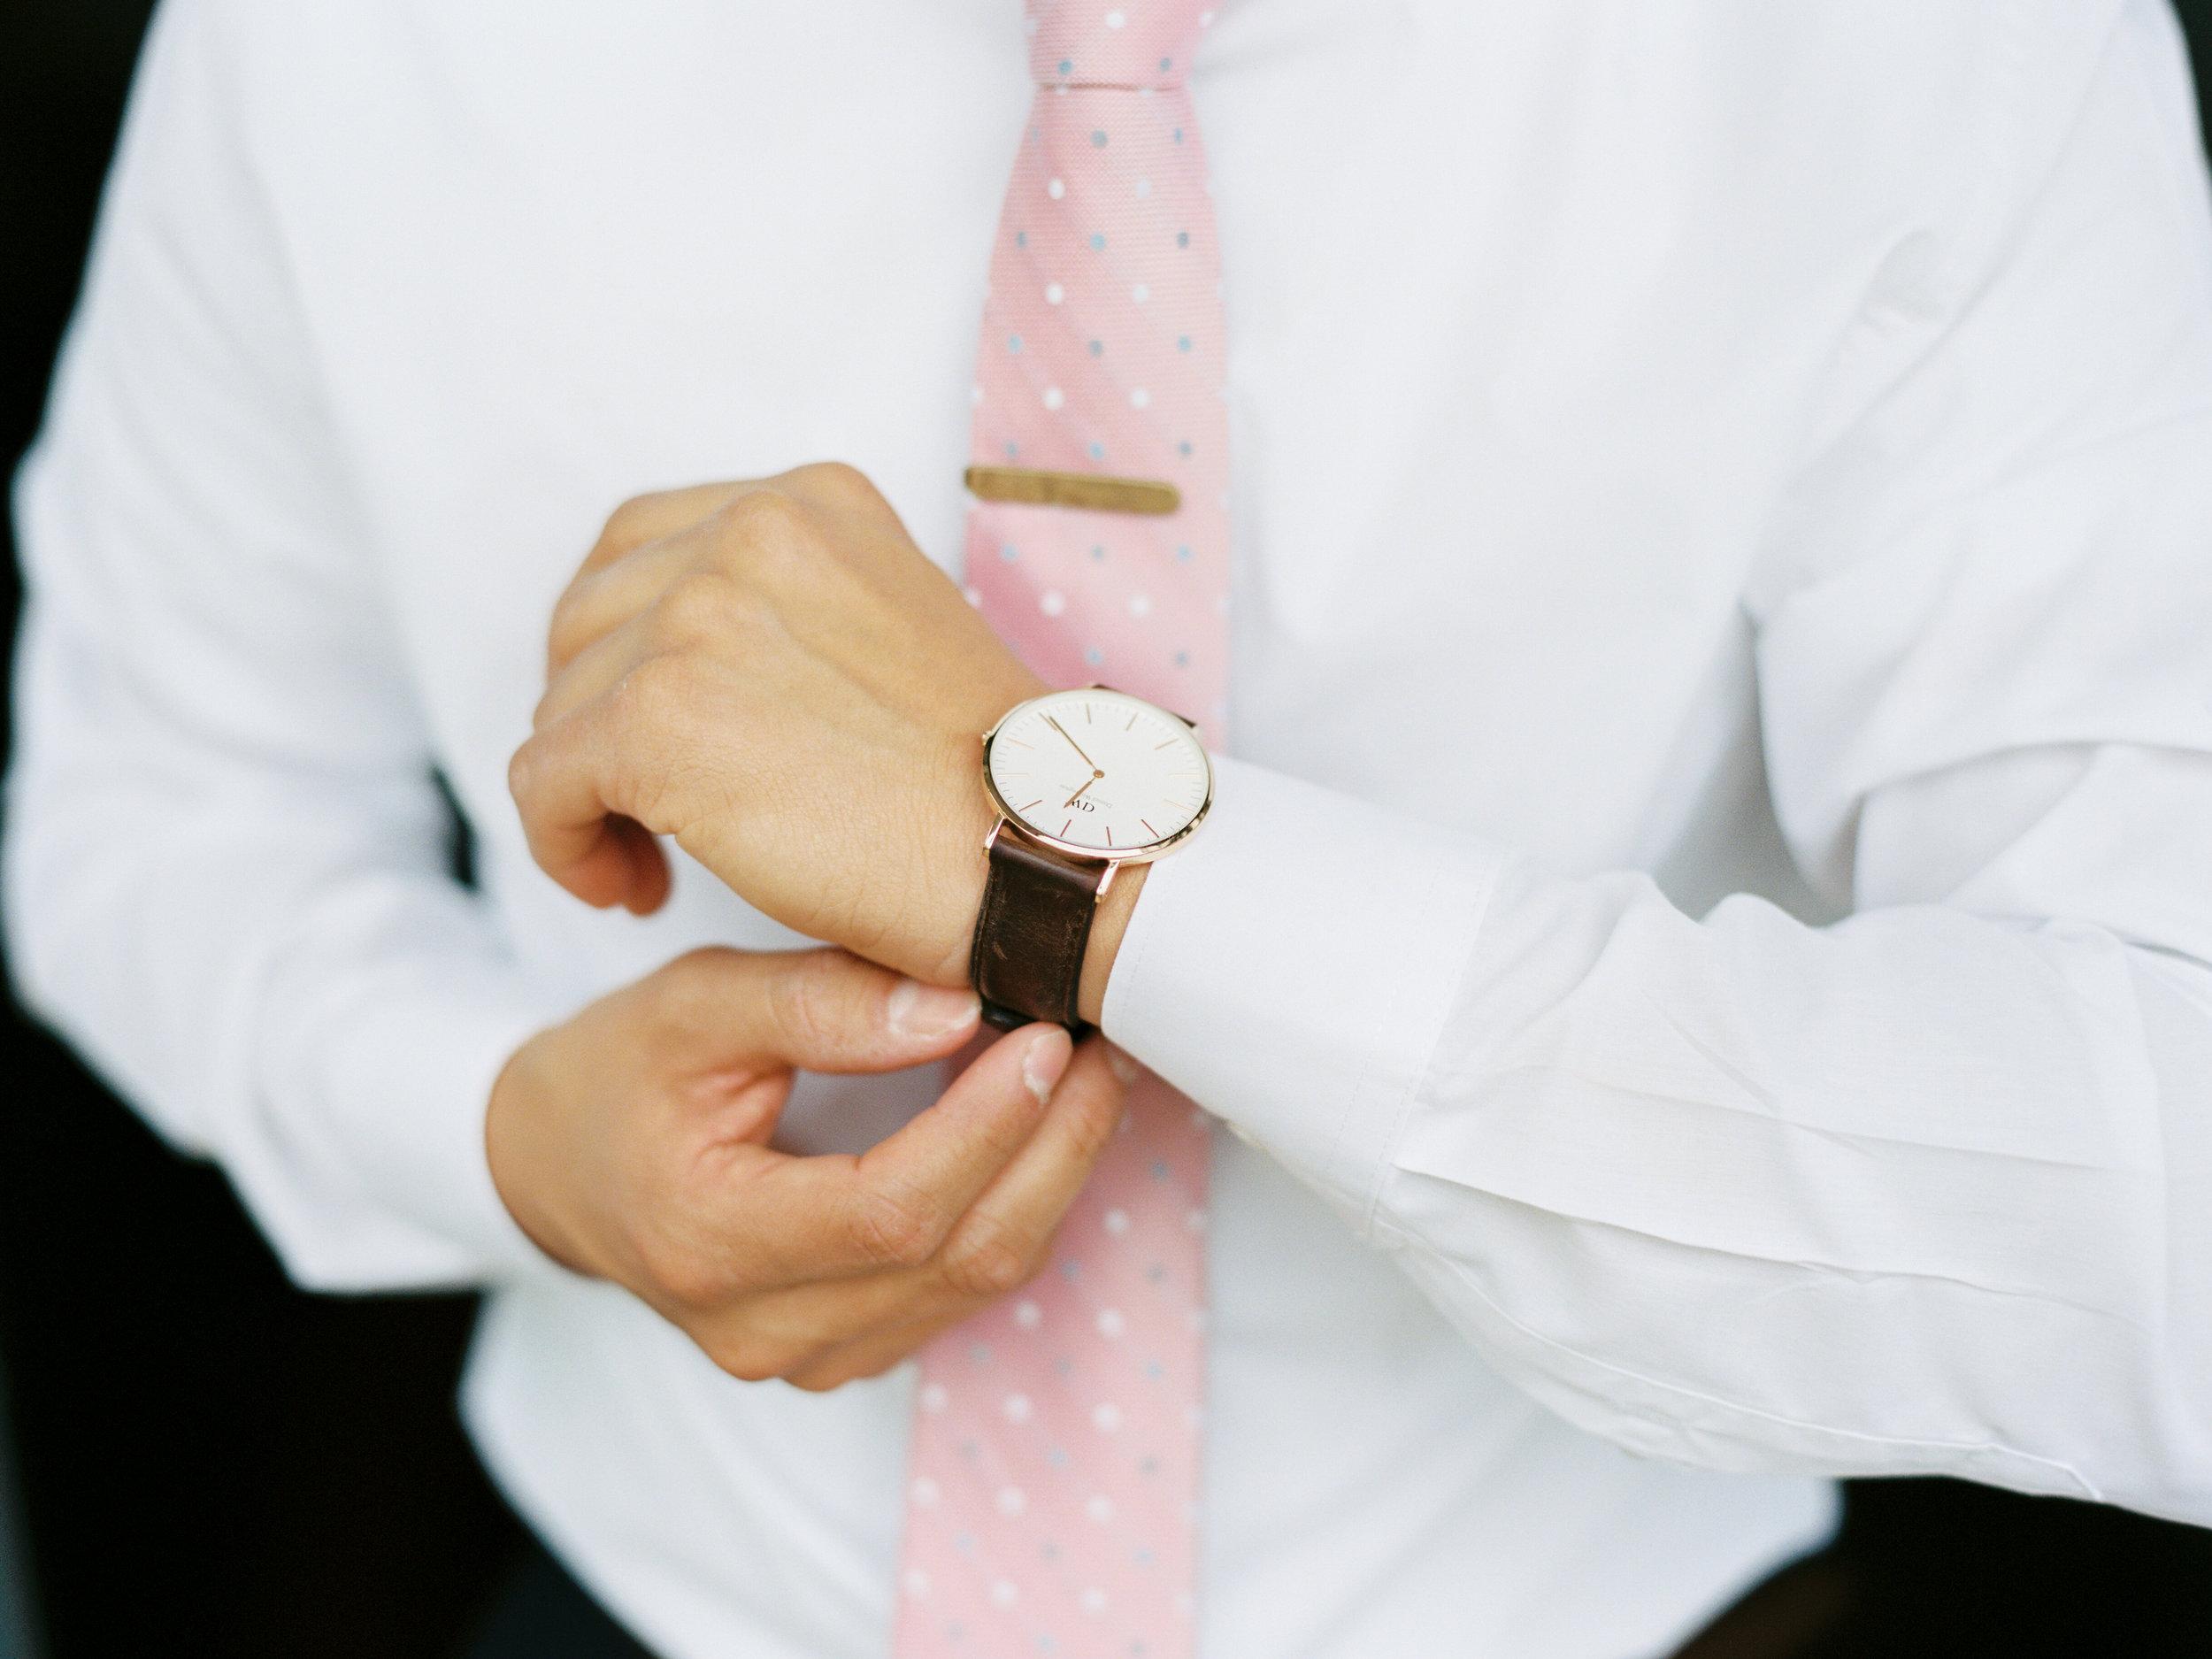 Shirt: H&M Watch: Daniel Wellington Tie: Ben Sherman